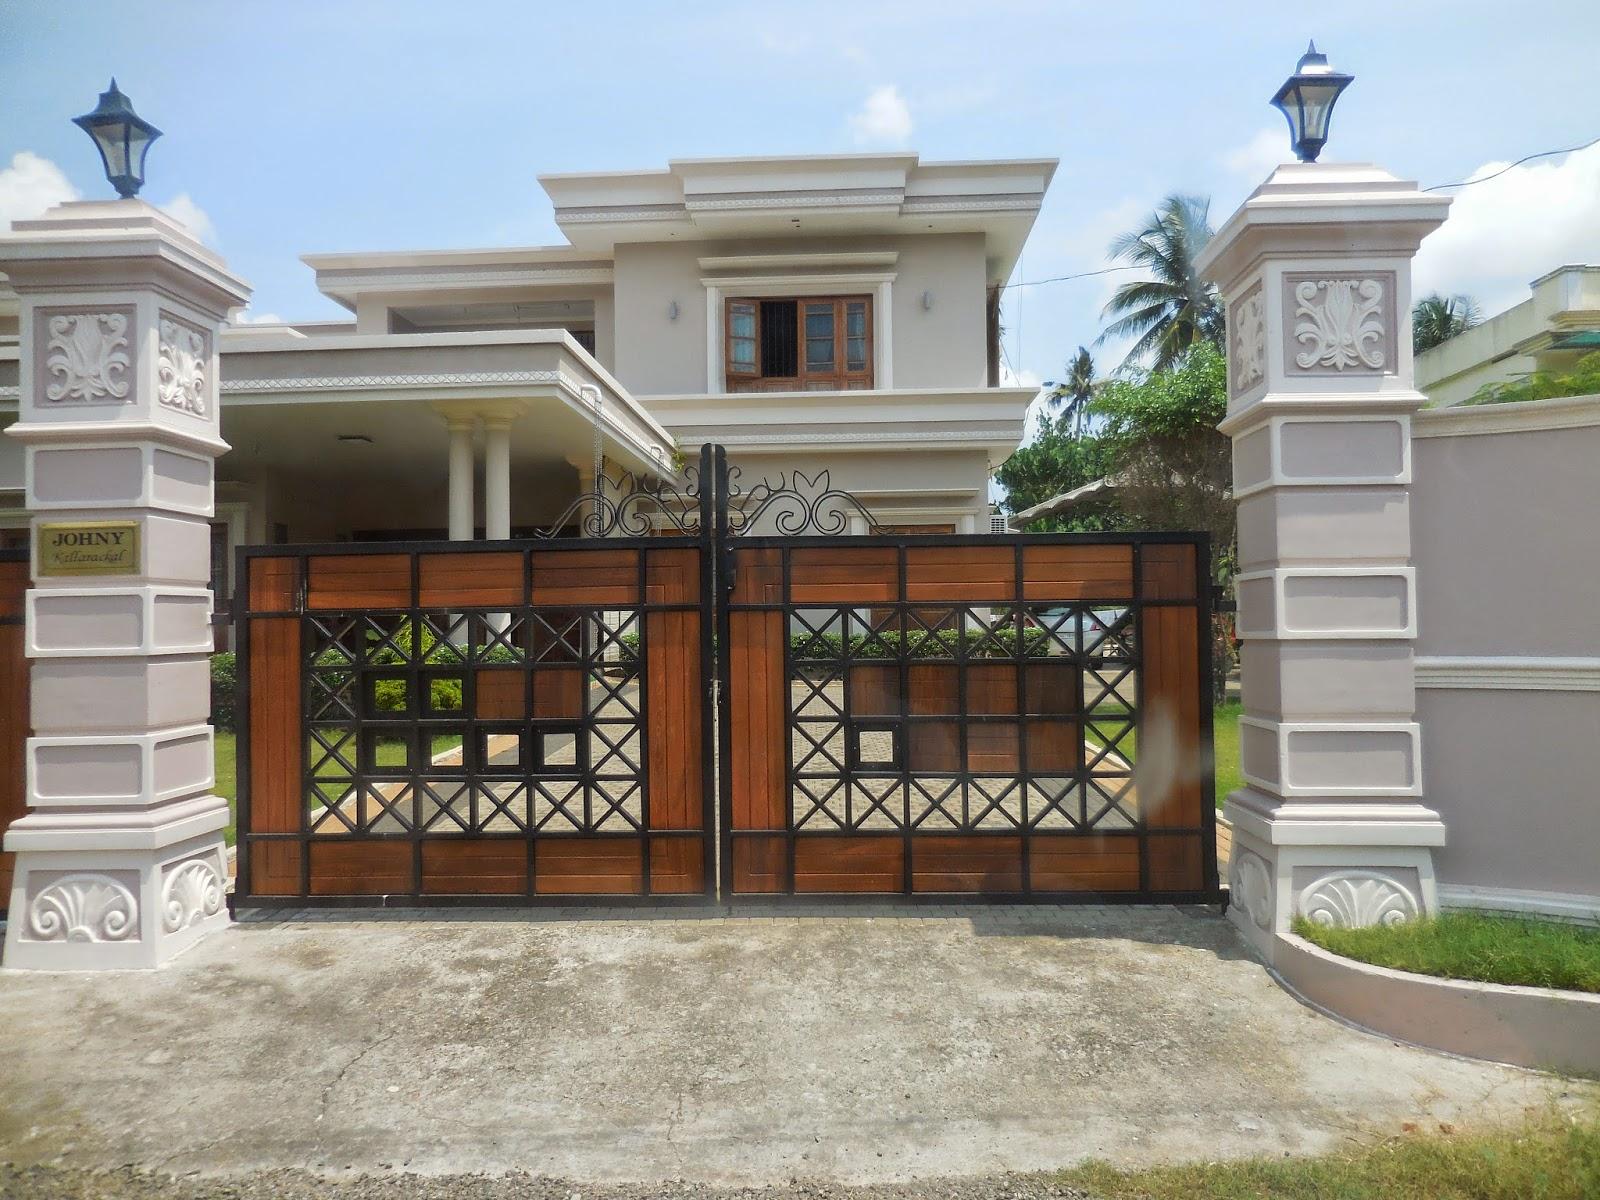 Kerala Gate Designs: A beautiful house gate from Kerala